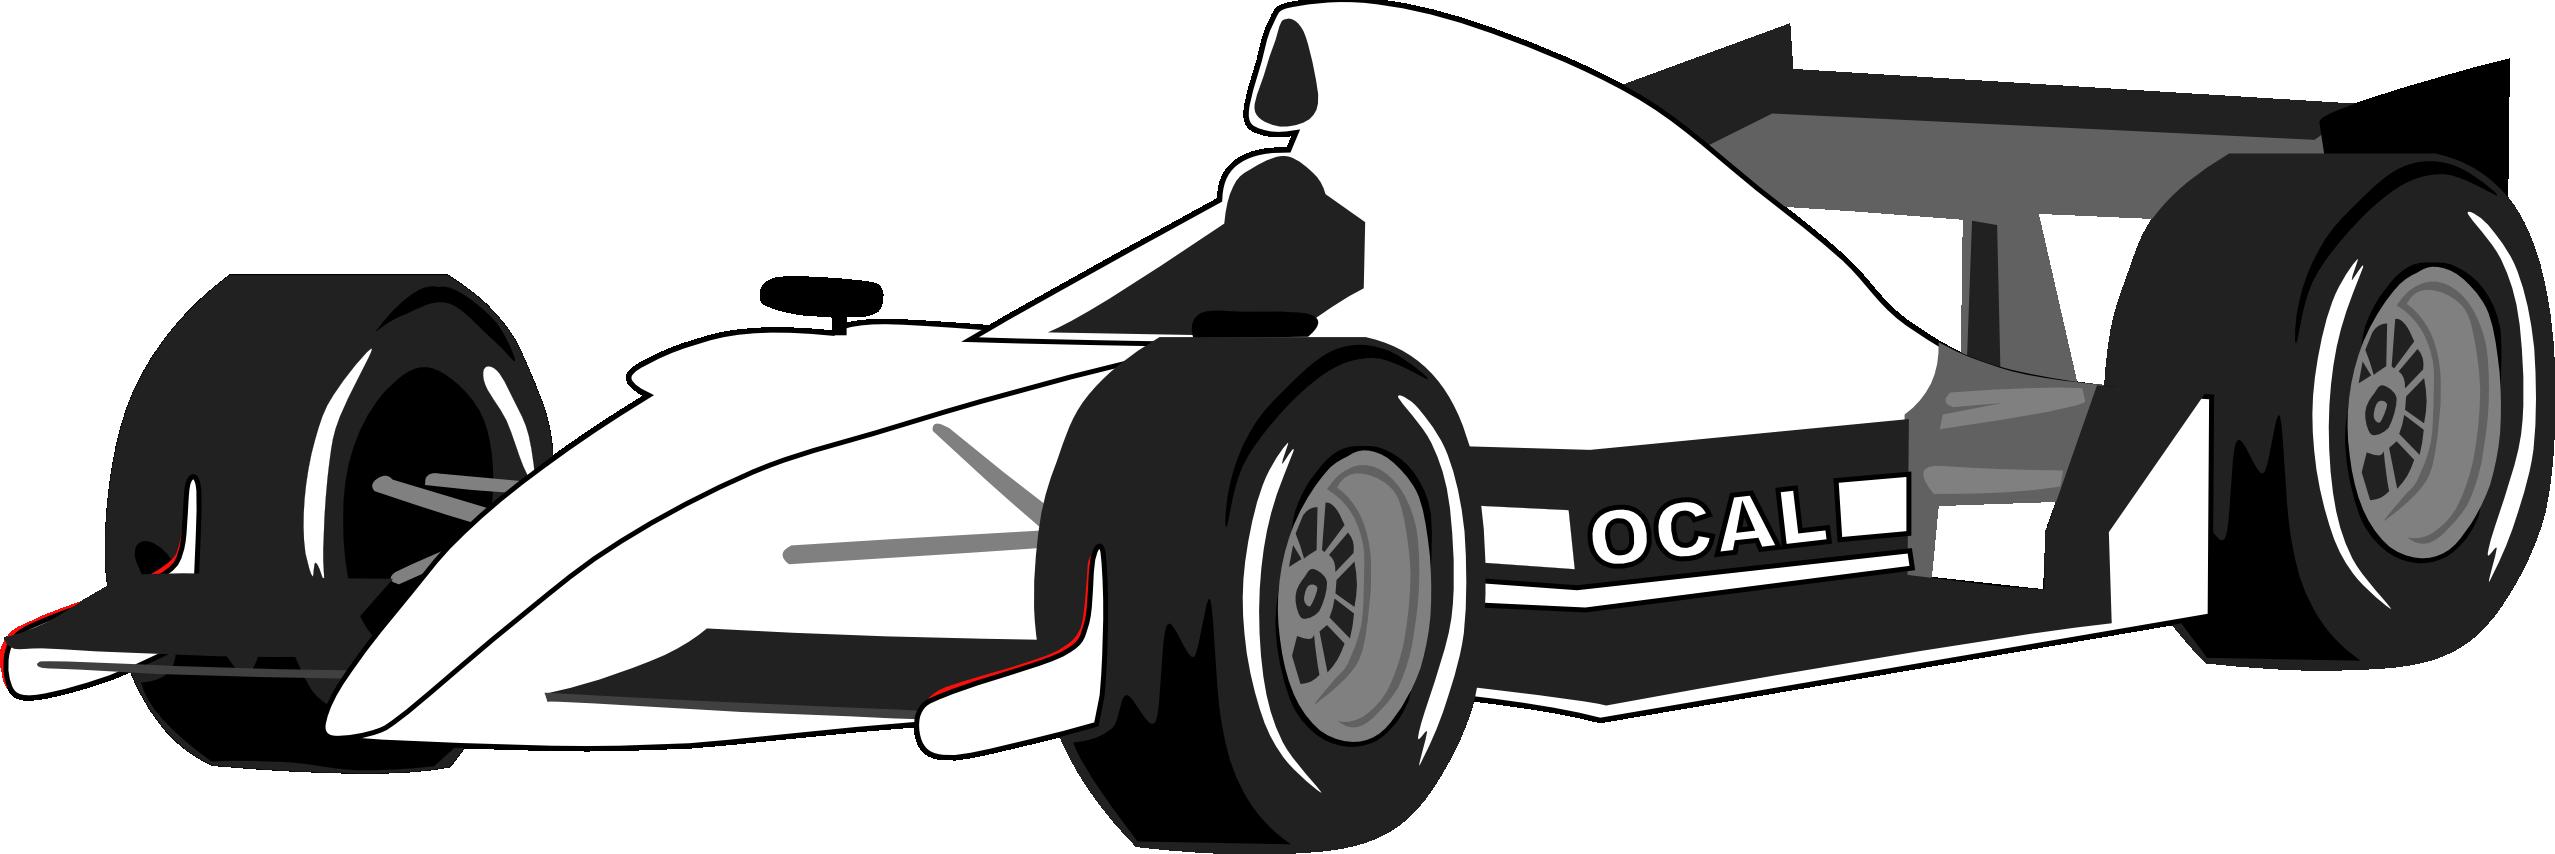 Black race car clipart svg black and white library Black And White Race Car PNG Transparent Black And White Race Car ... svg black and white library